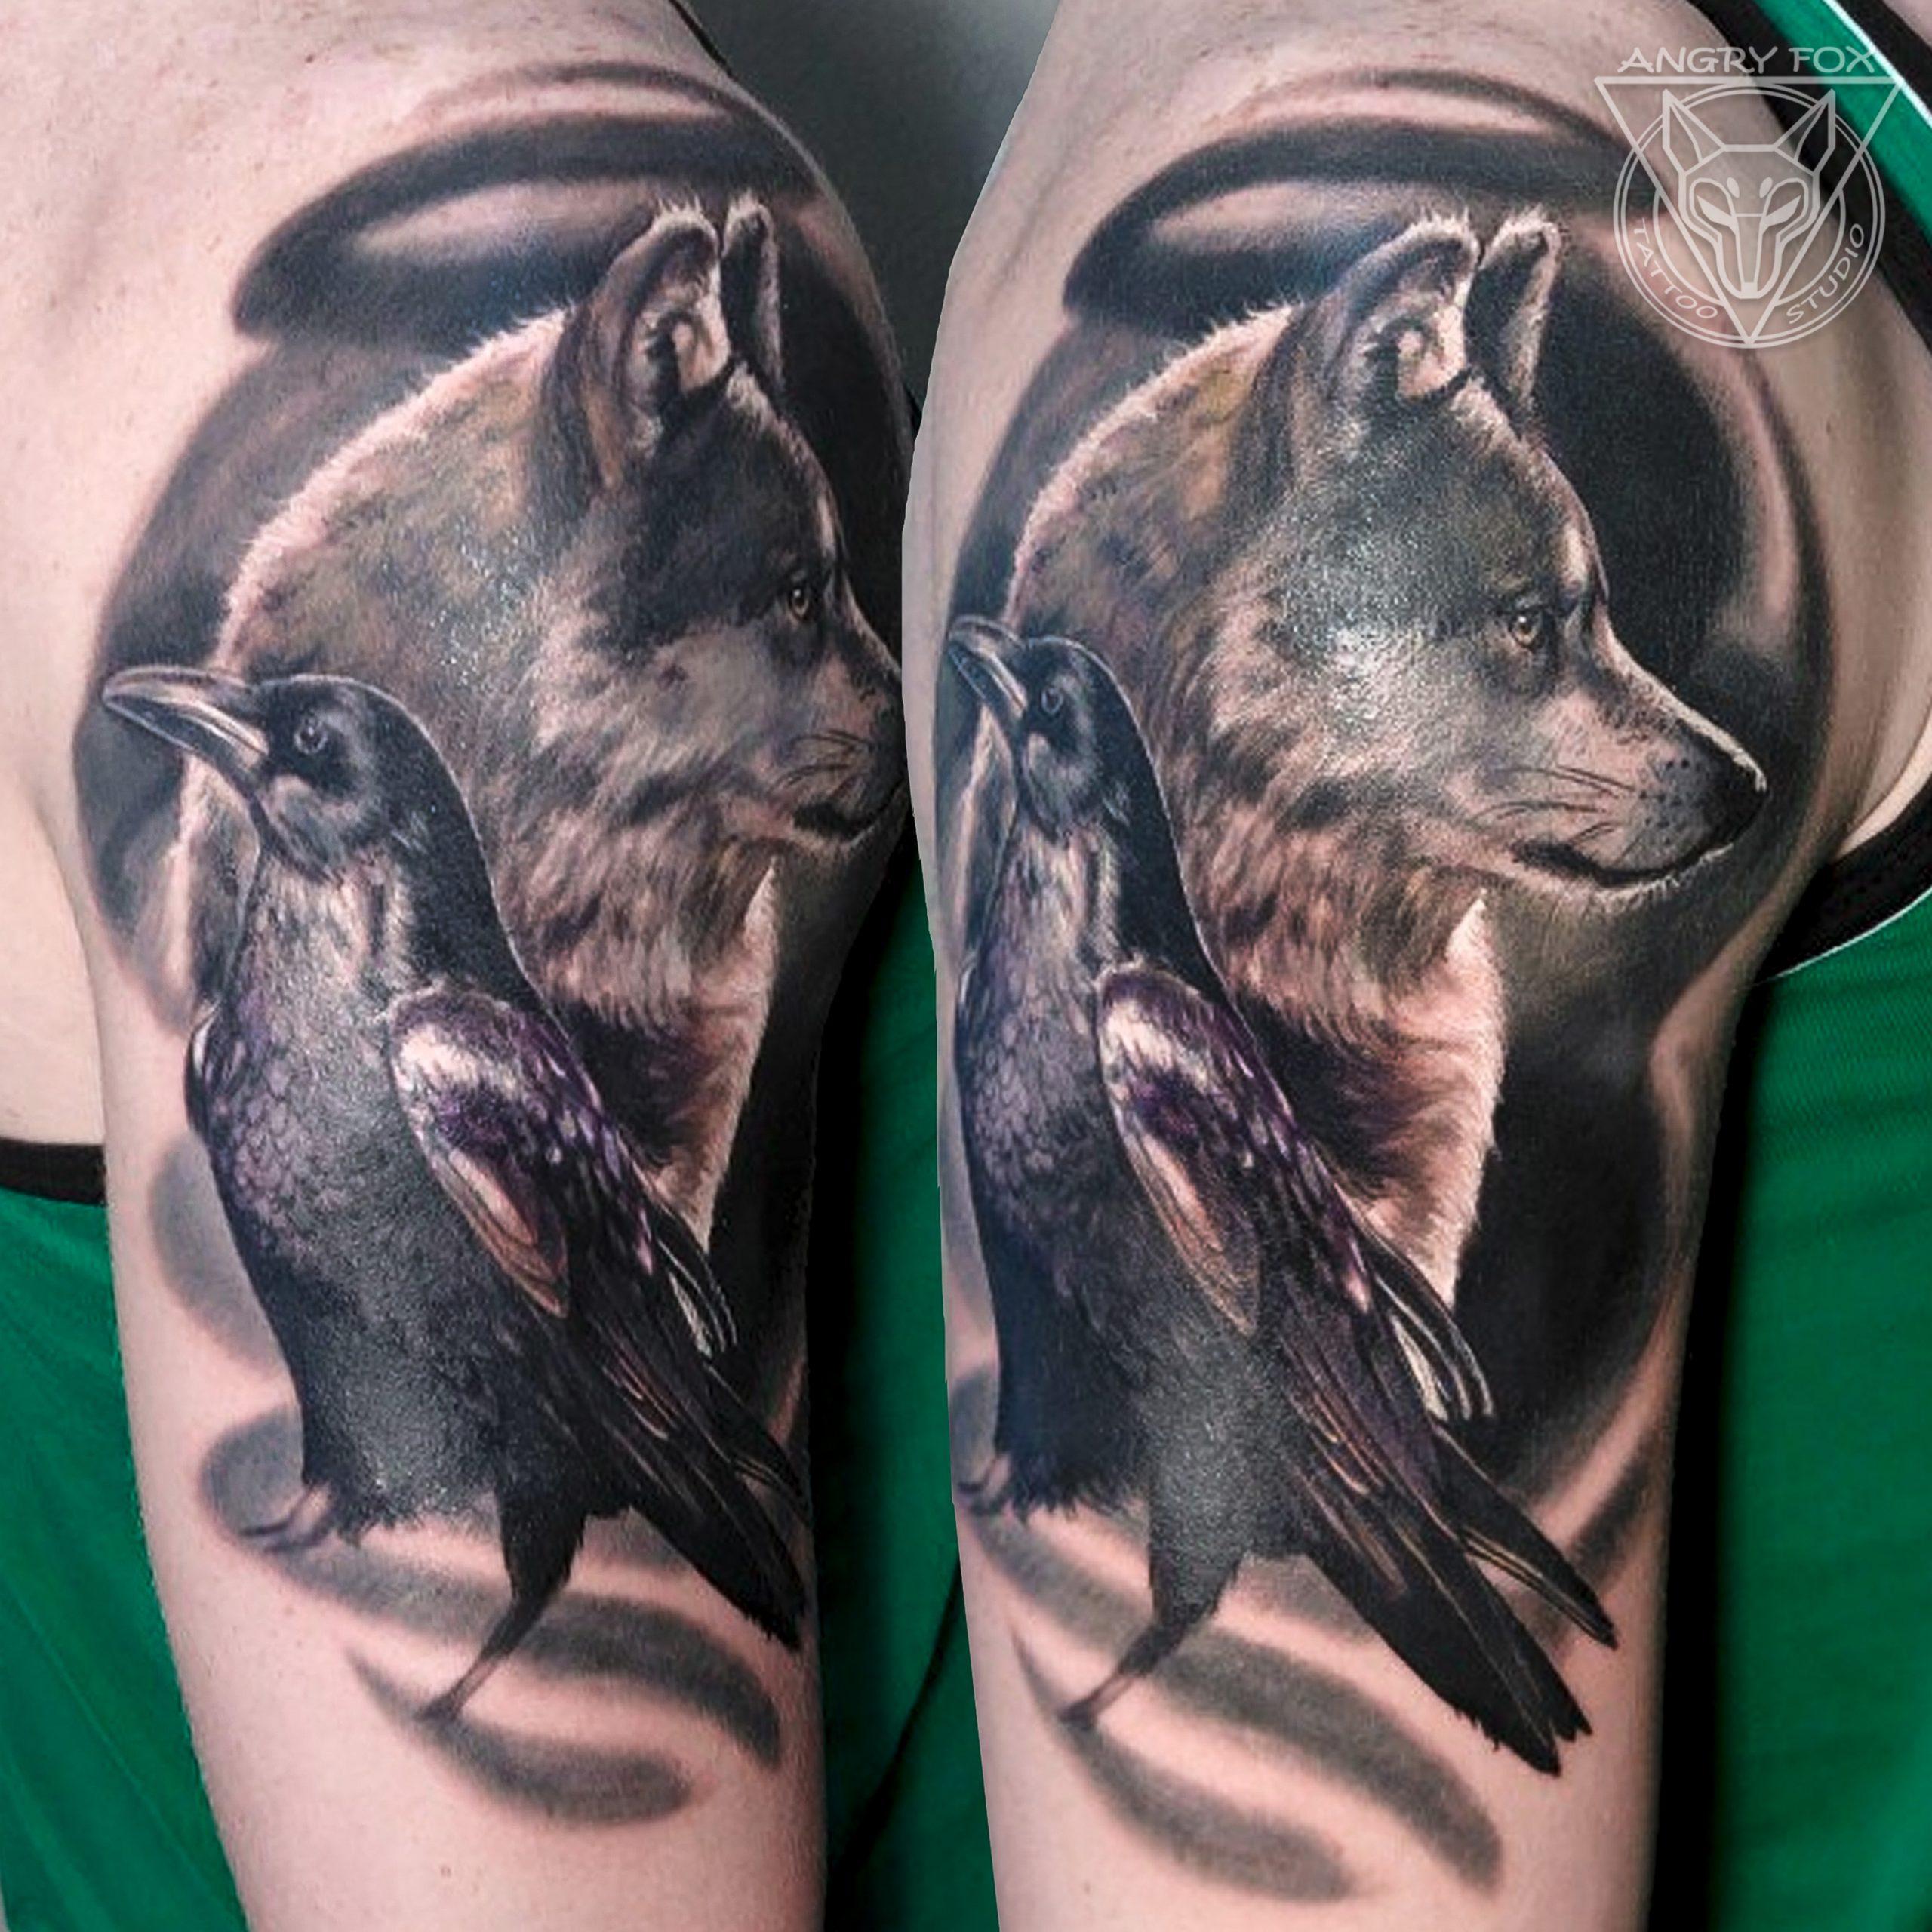 татуировка, тату, плечо, рука, реализм, акварель, ворон, волк